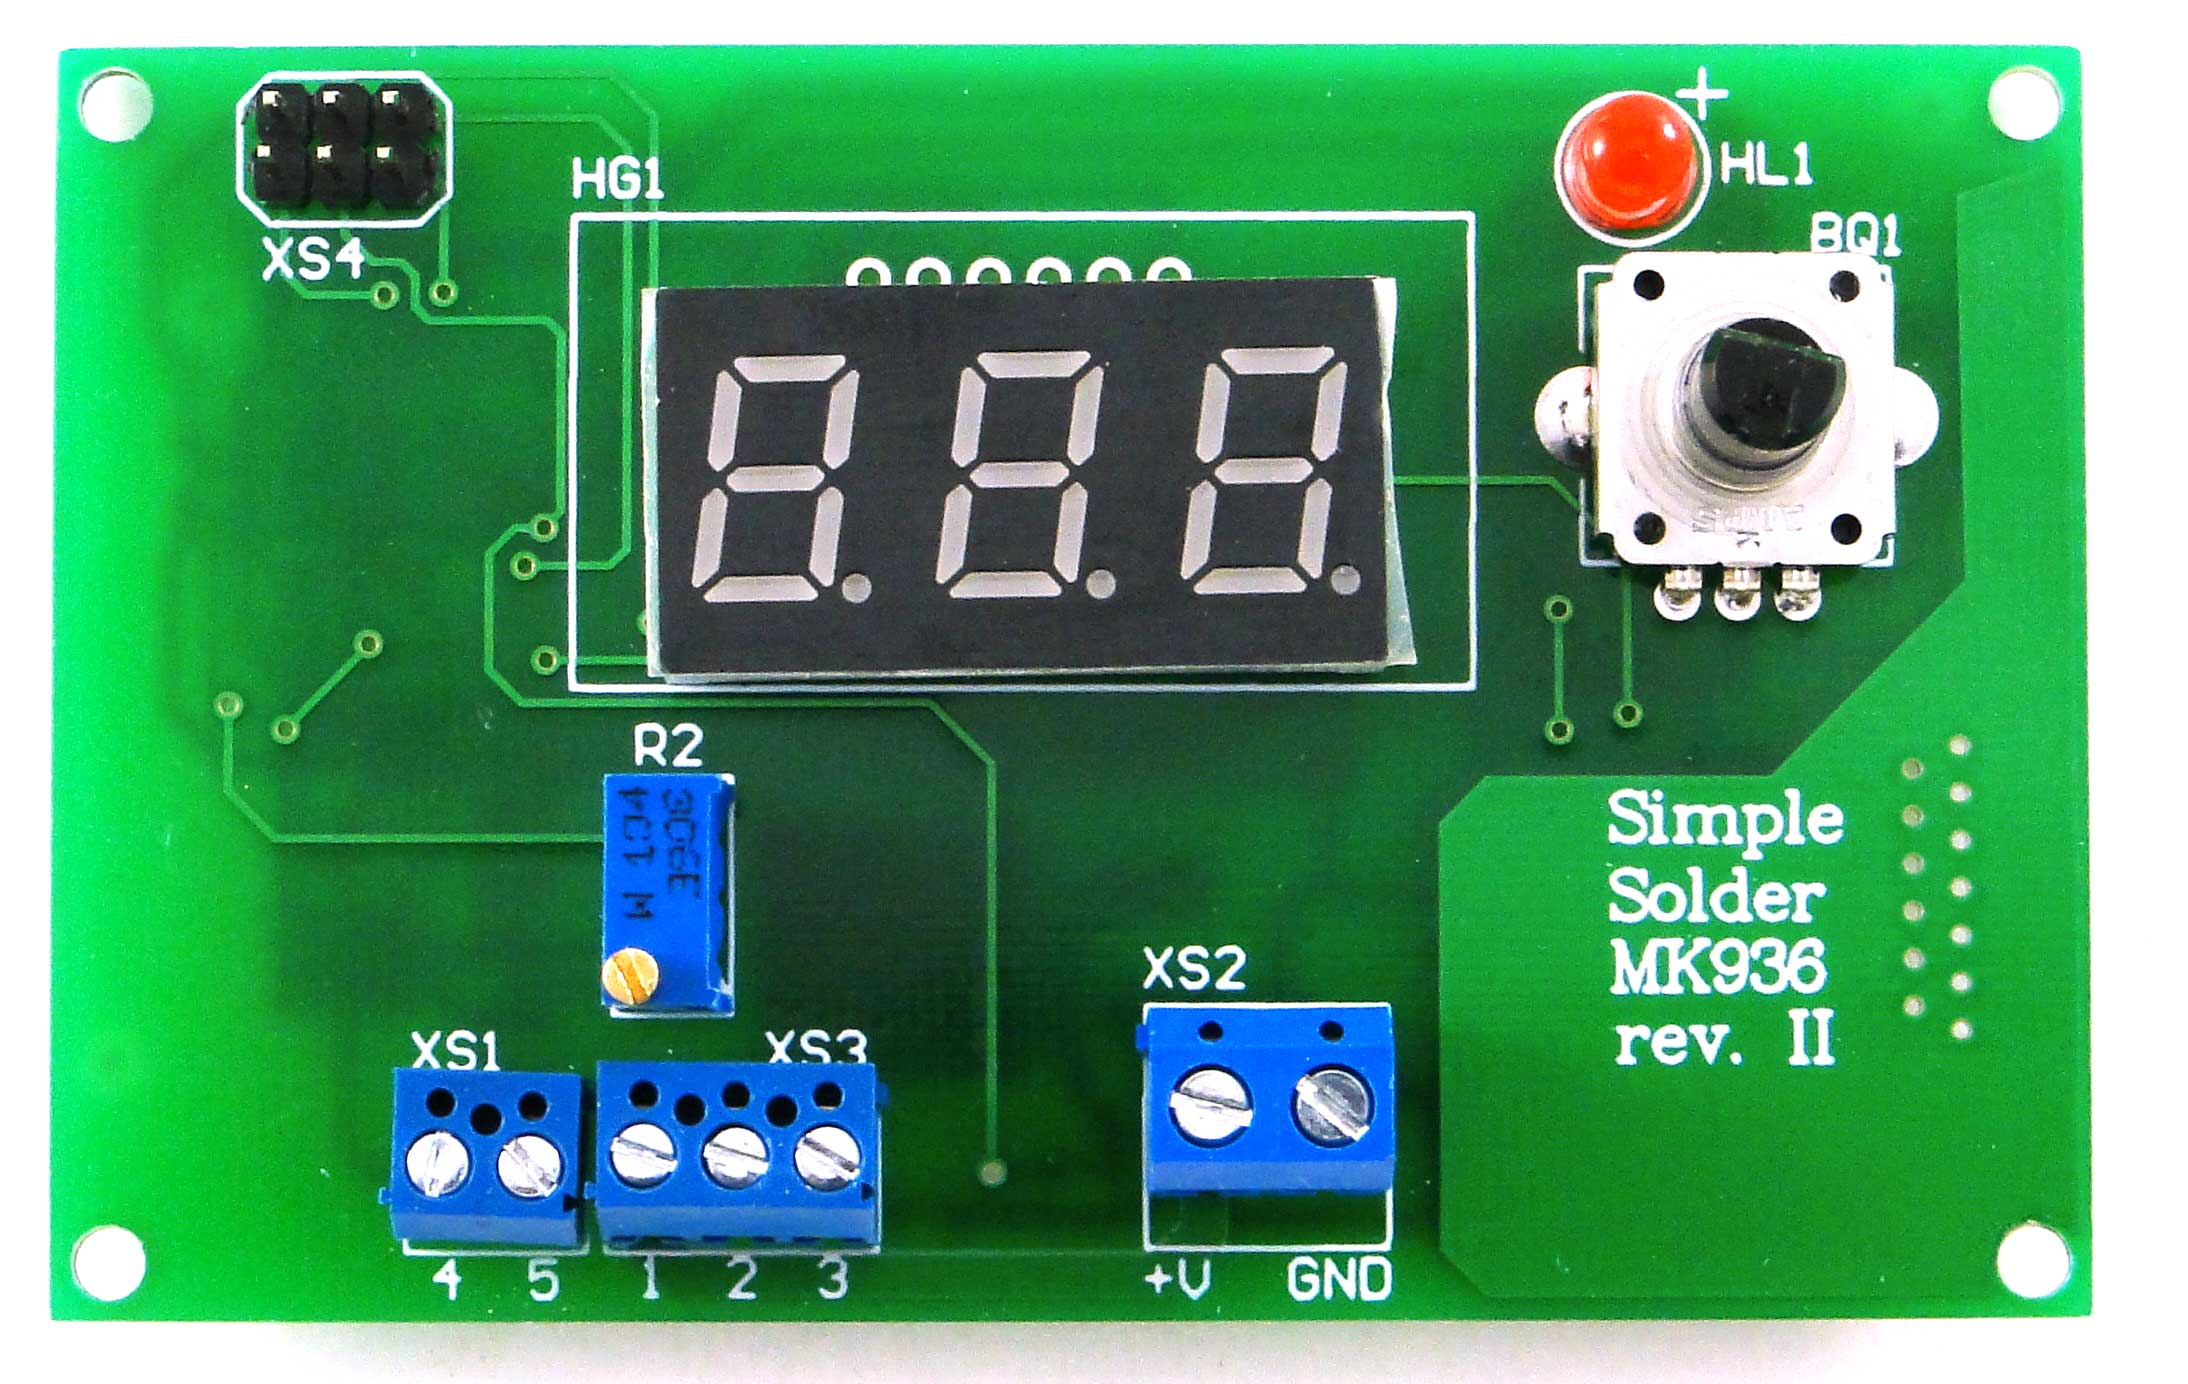 Simple Solder MK936 SMD. Паяльная станция на SMD-компонентах своими руками - 8